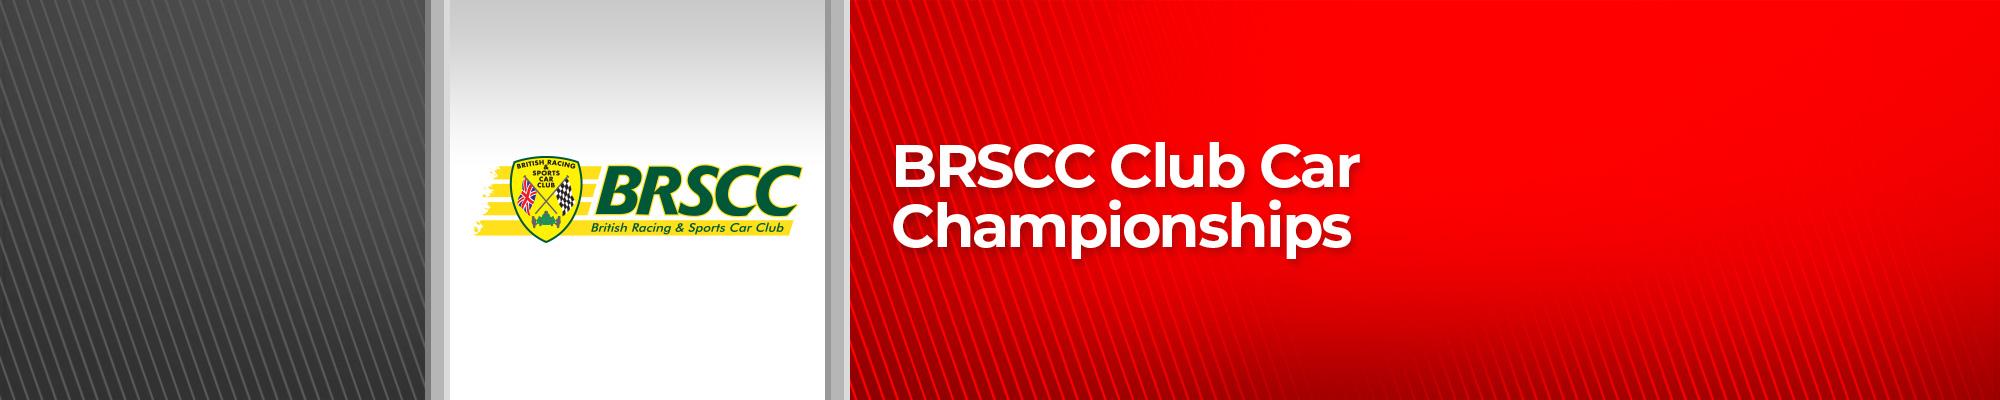 BRSCC Mazda Raceday